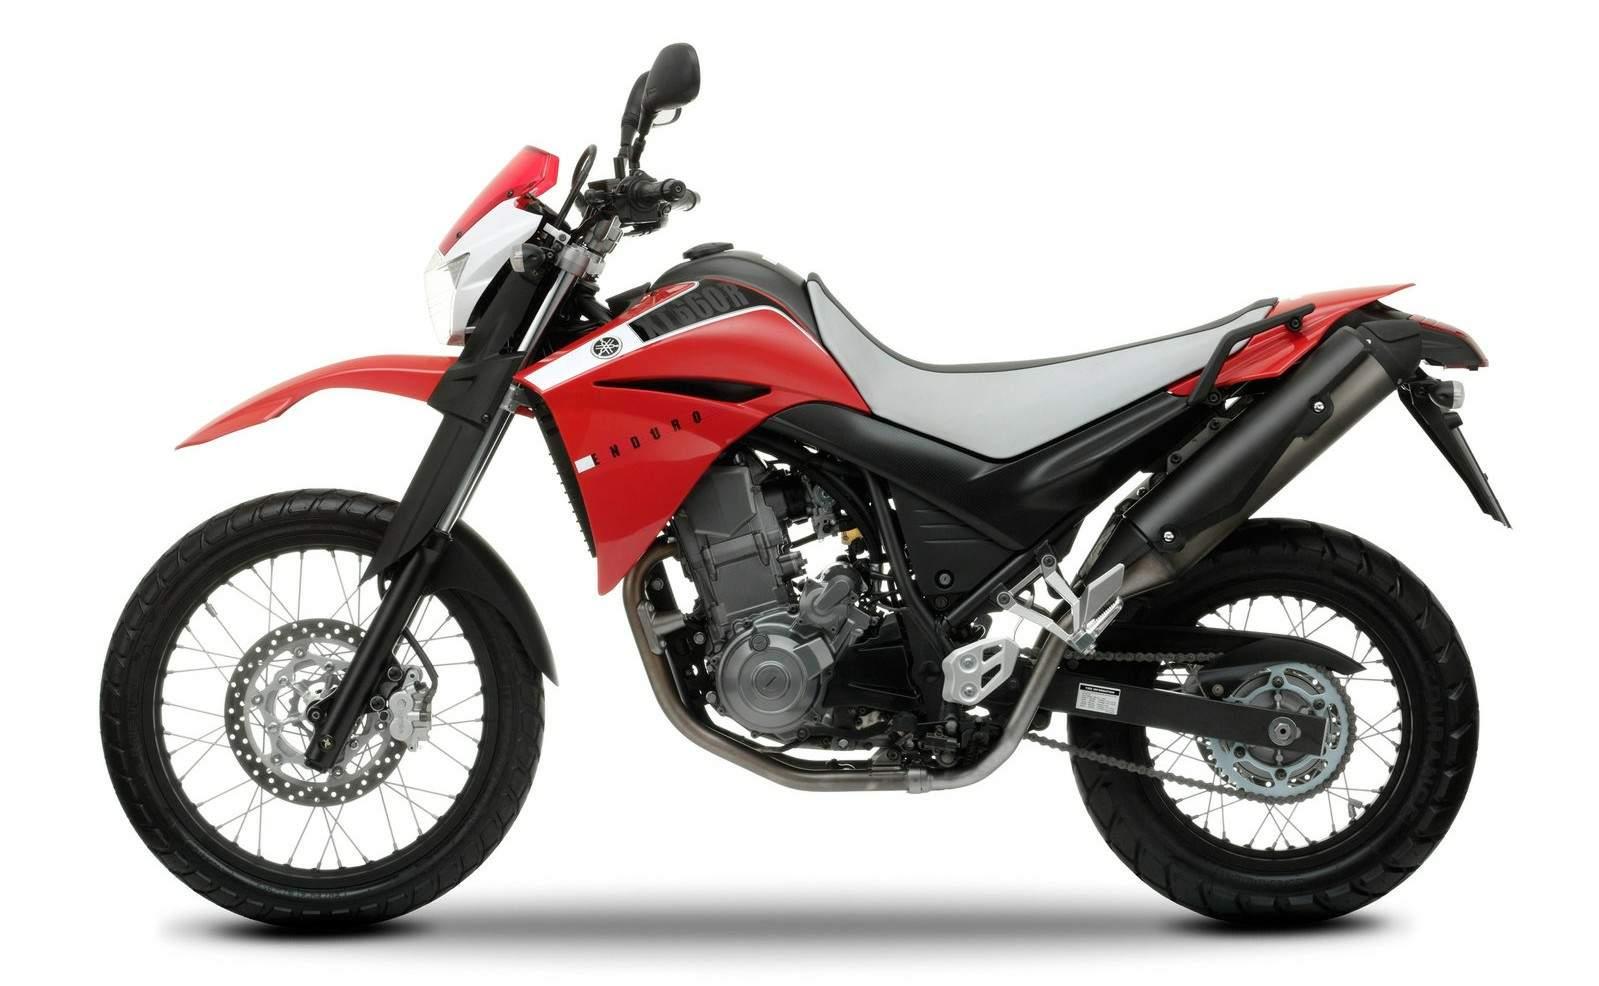 Ficha técnica da Yamaha XT660R 2005 a 2019